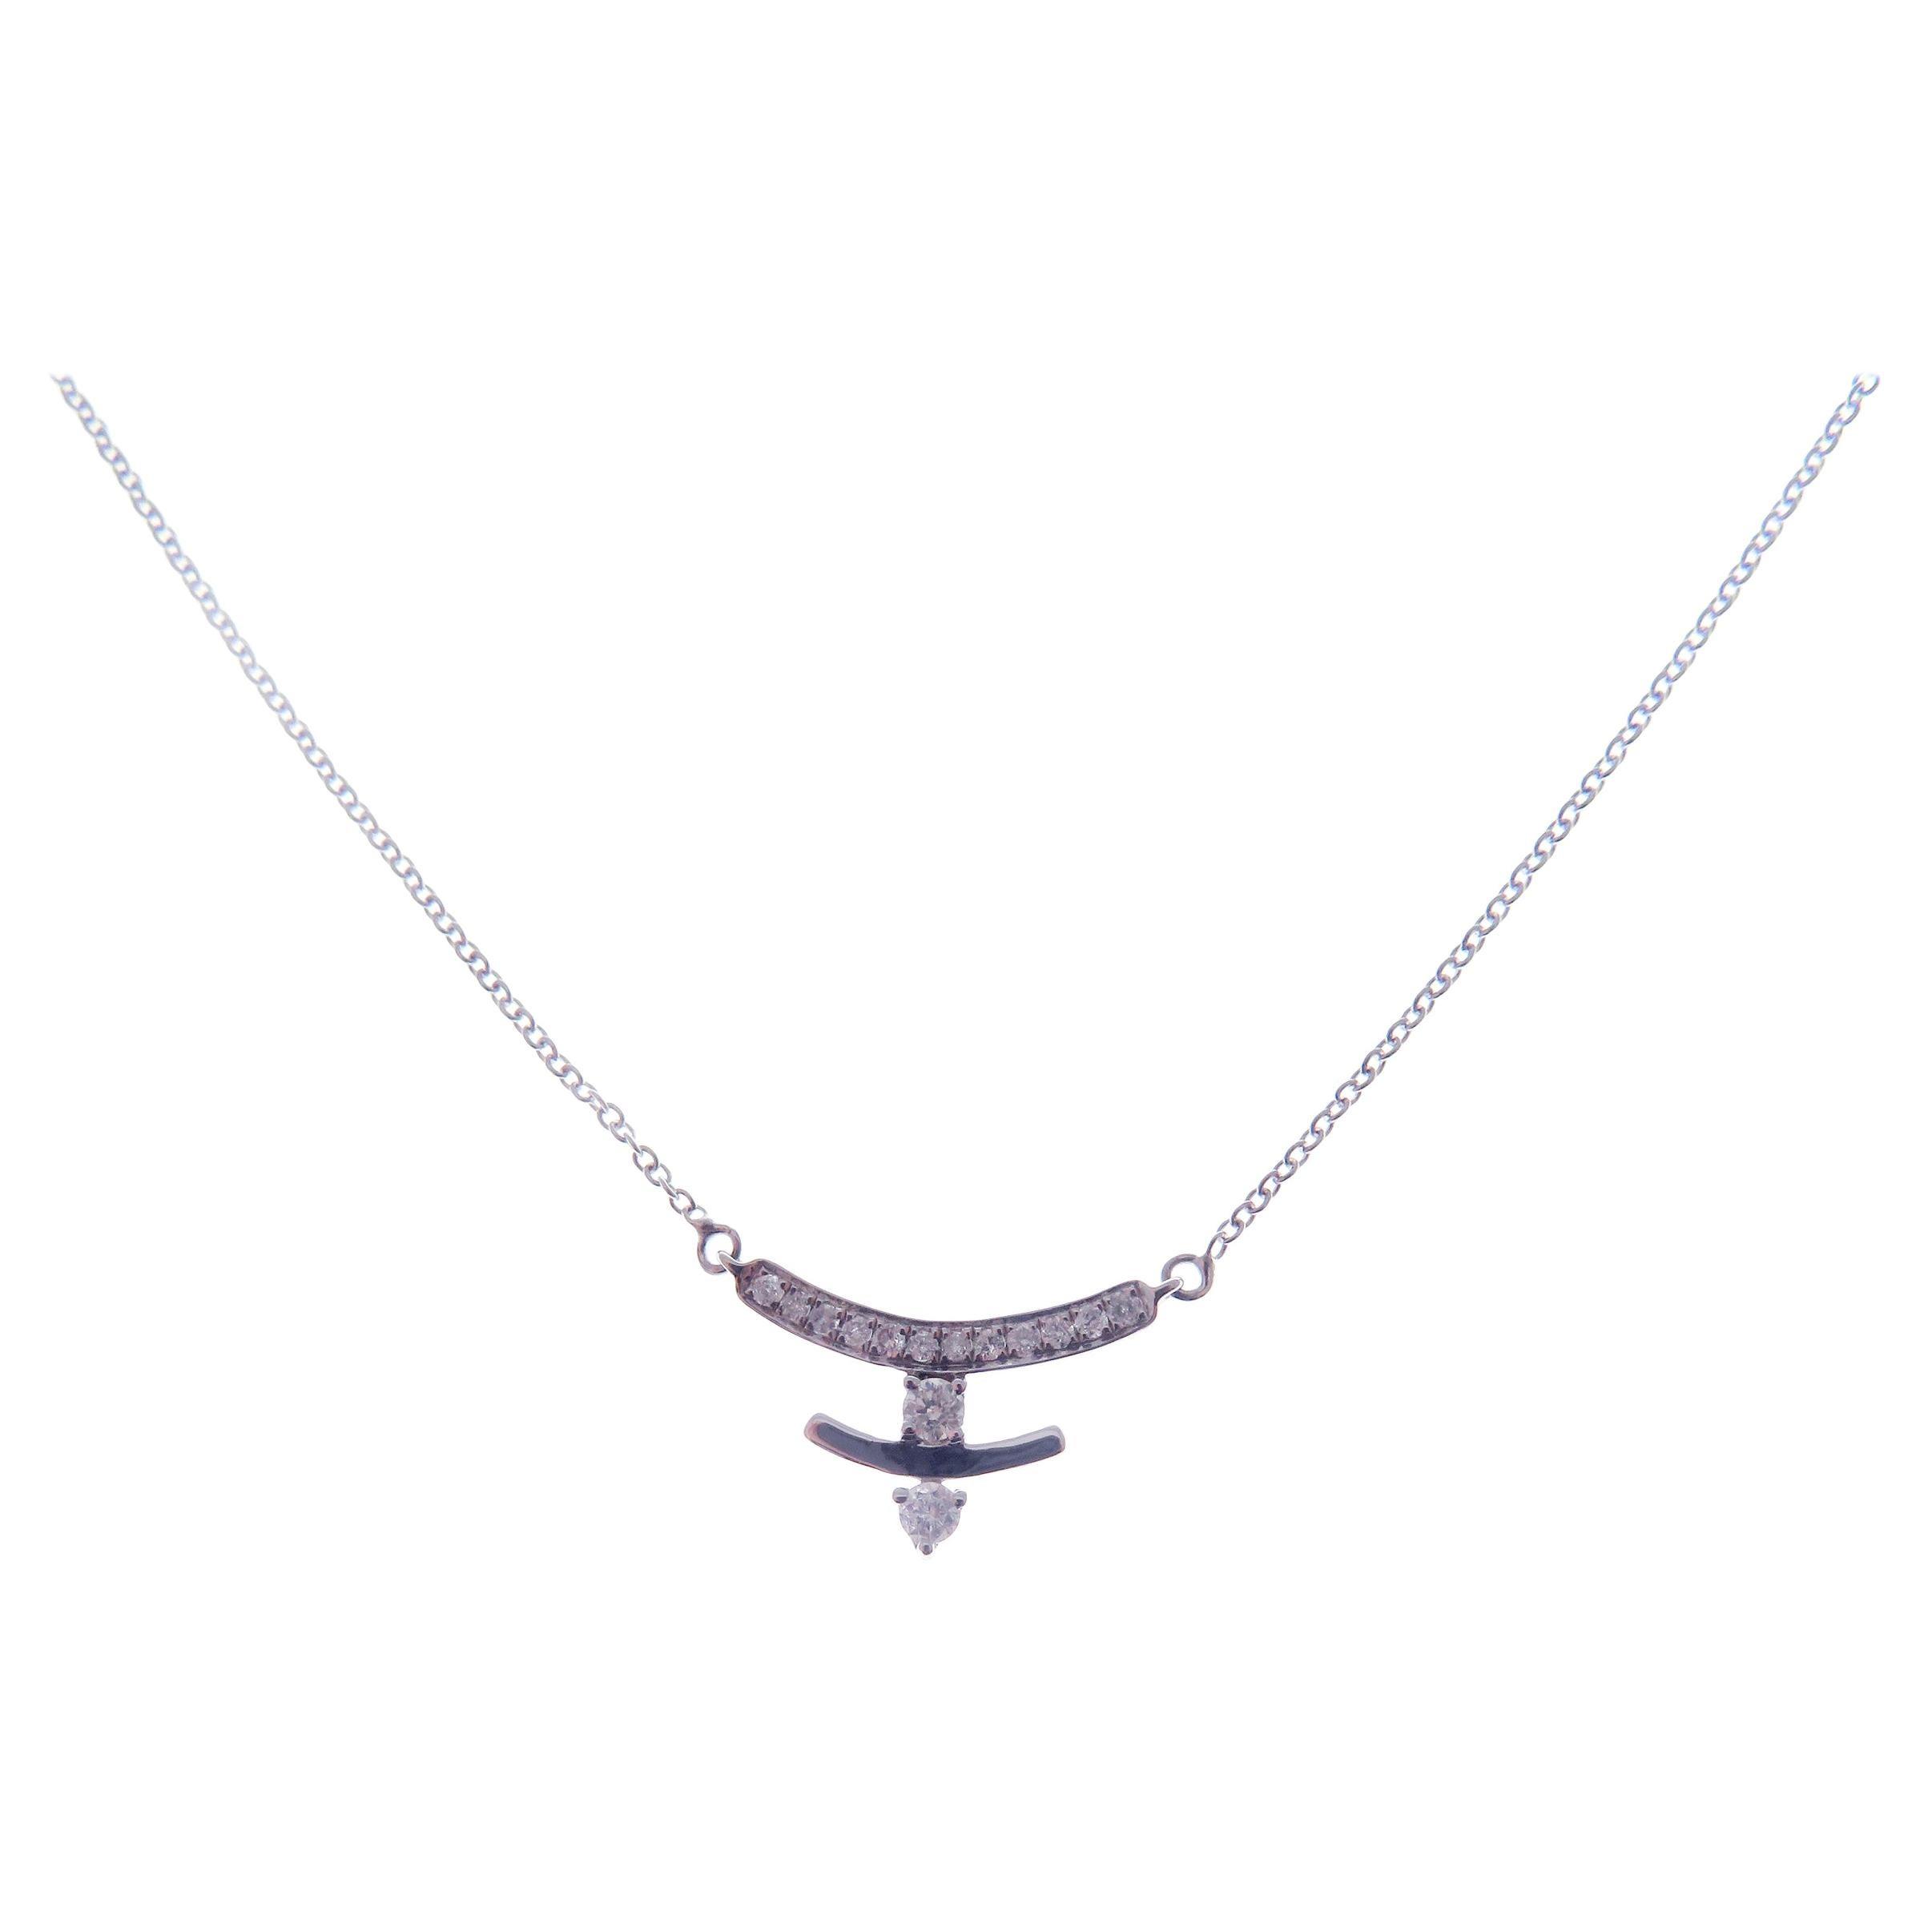 18 Karat White Gold Diamond Small U Shape Delicate Pendant Necklace